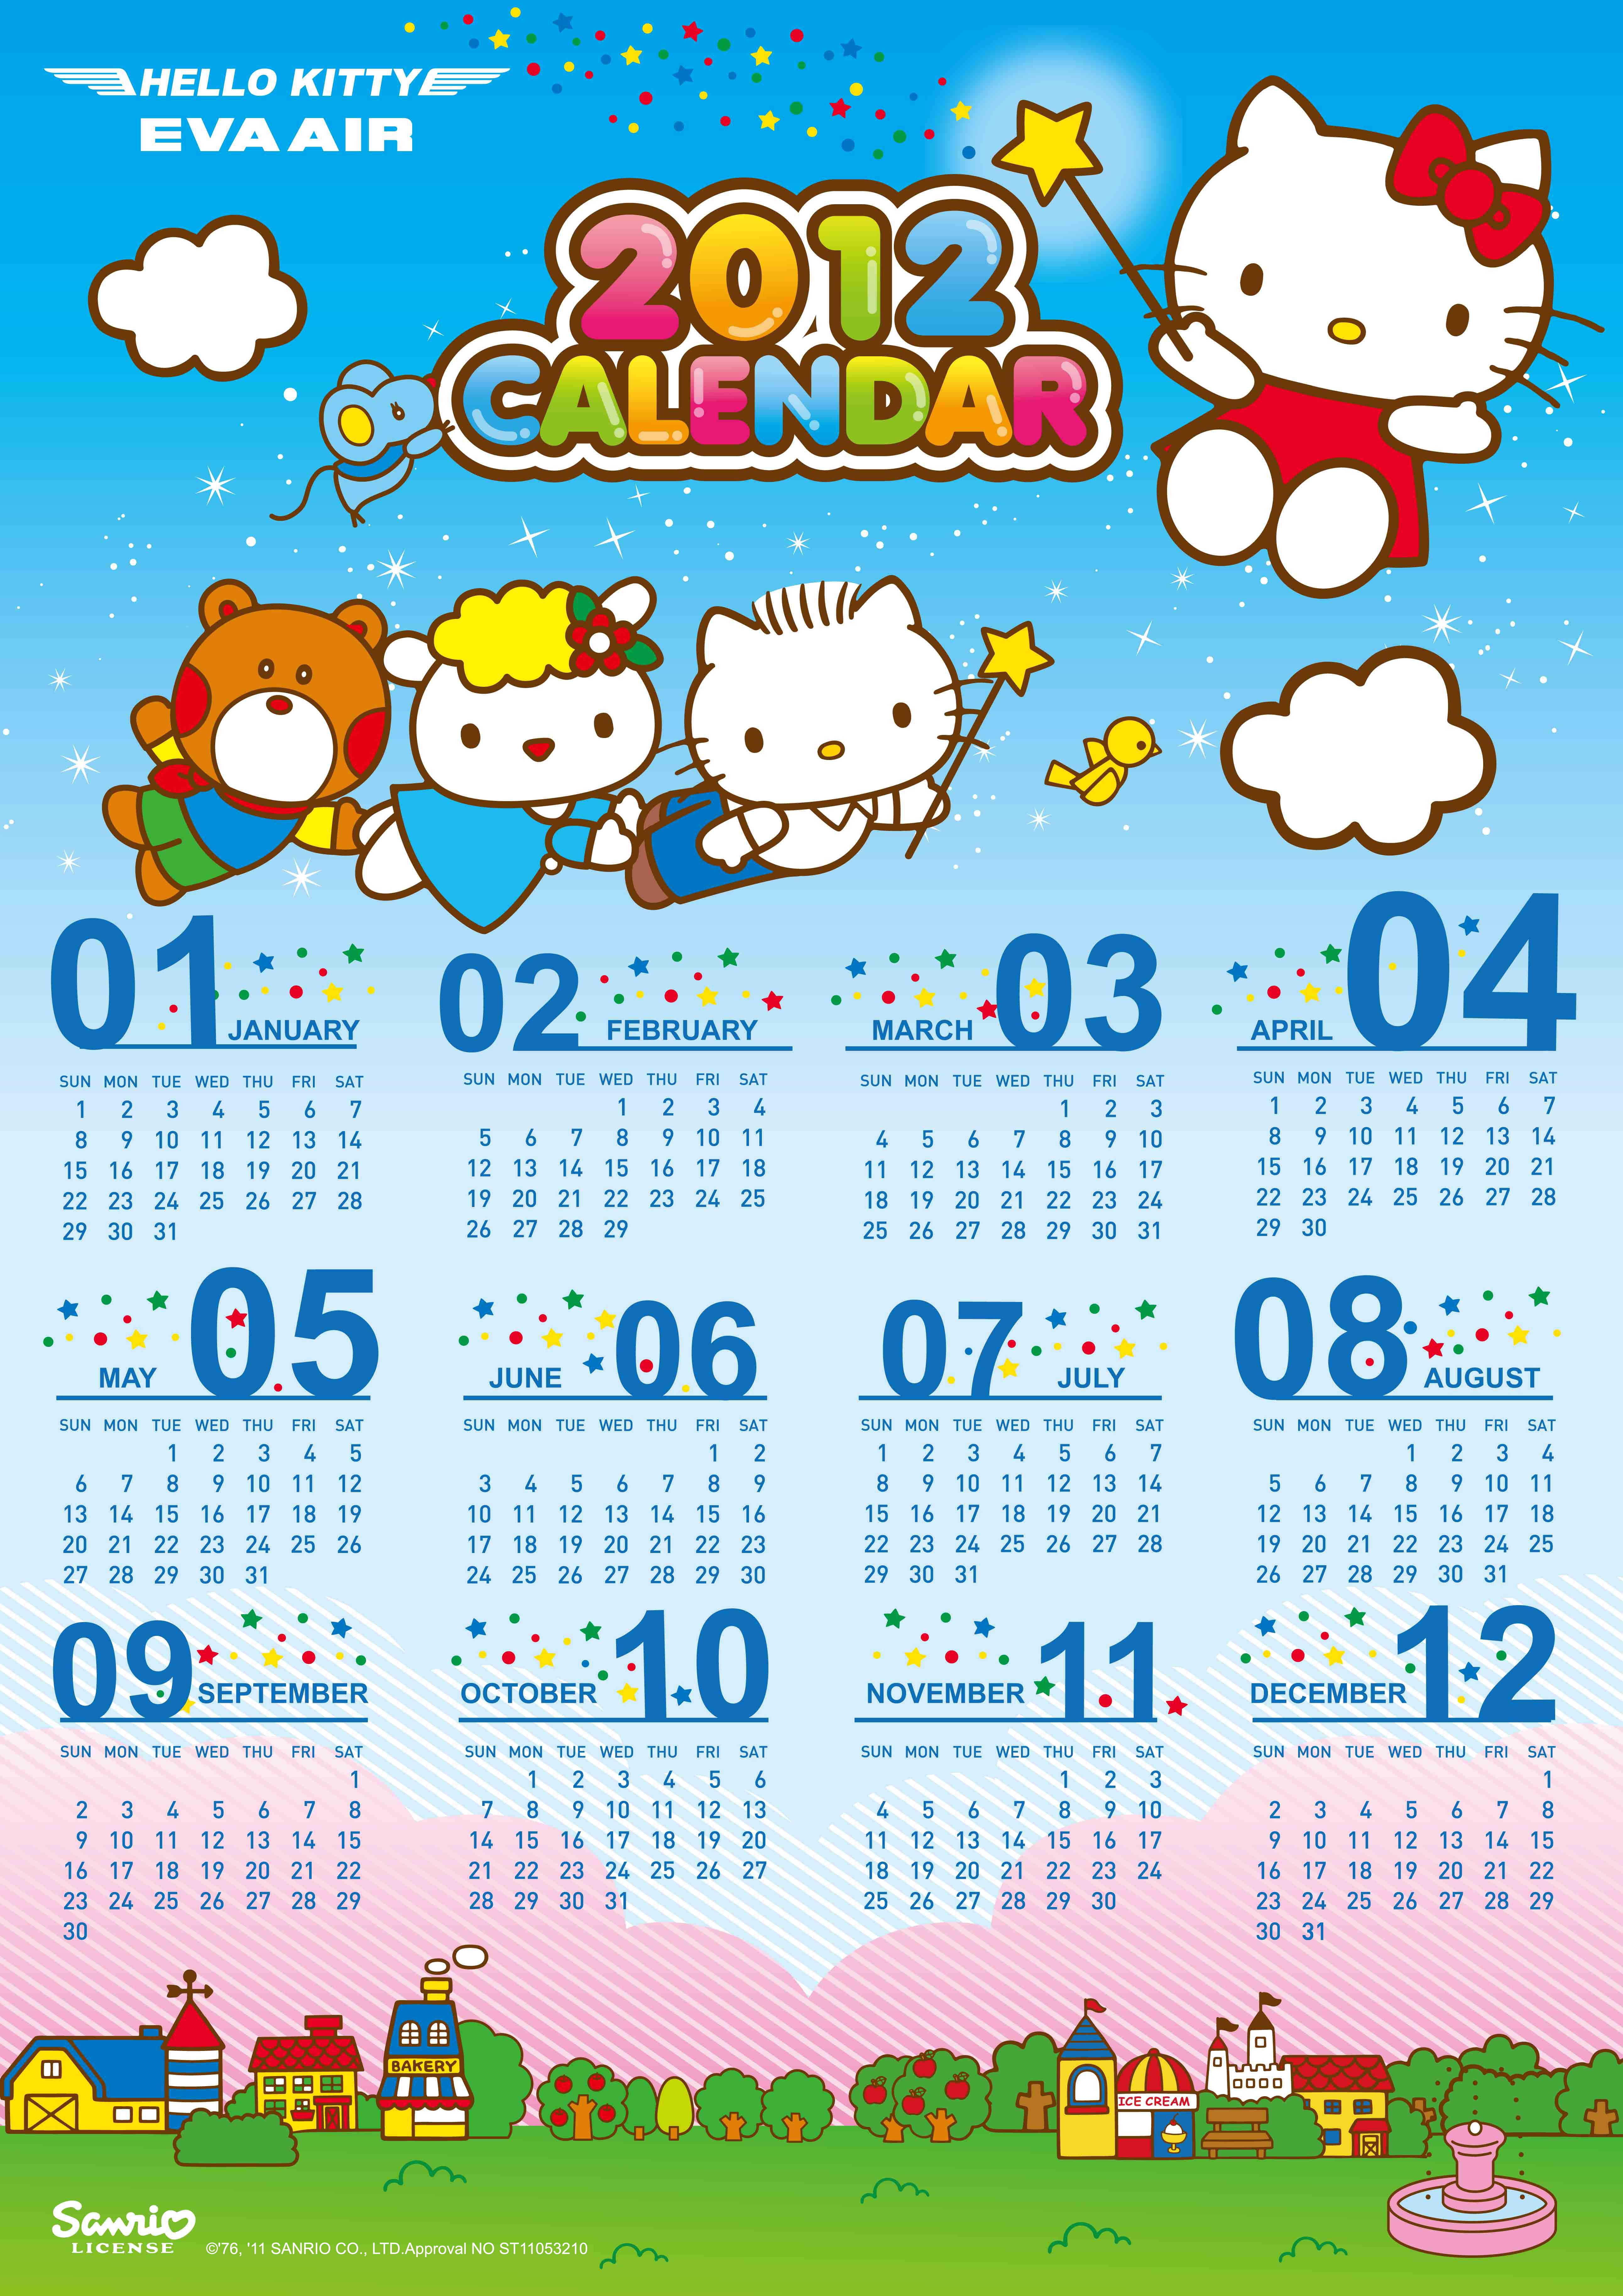 HelloKitty_Calendar_v2